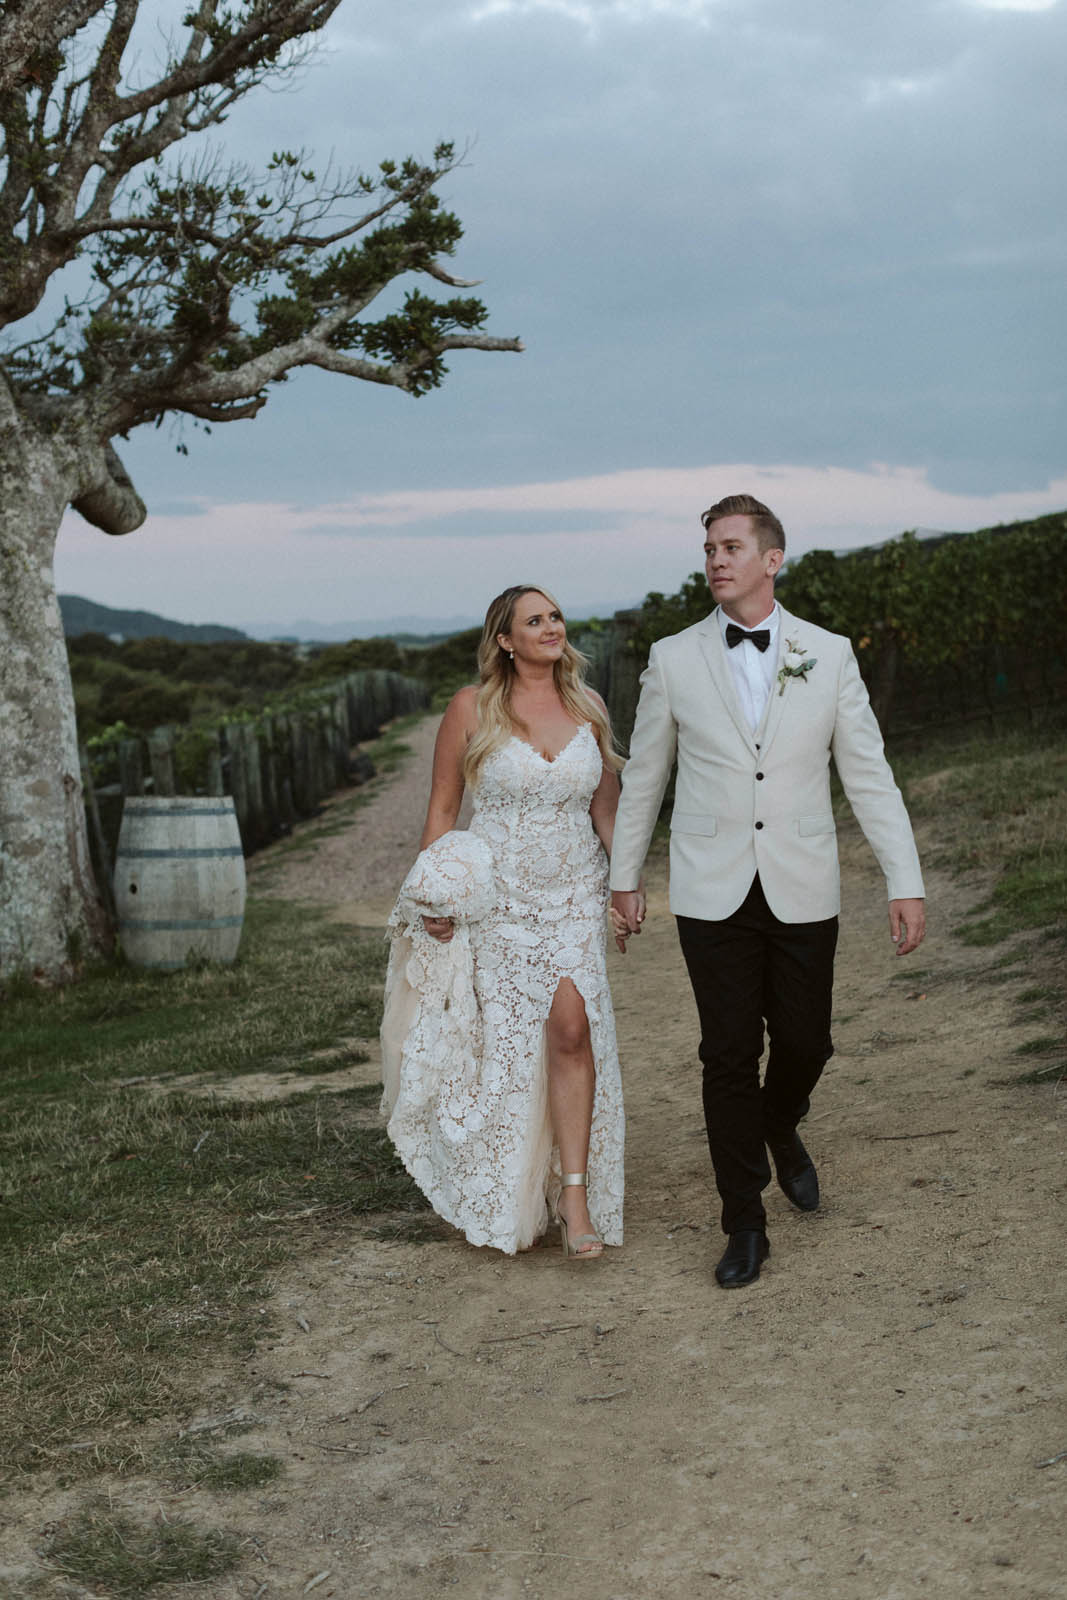 Rachel And Richard Nz Weddings Della Pieta Hera Couture_0036